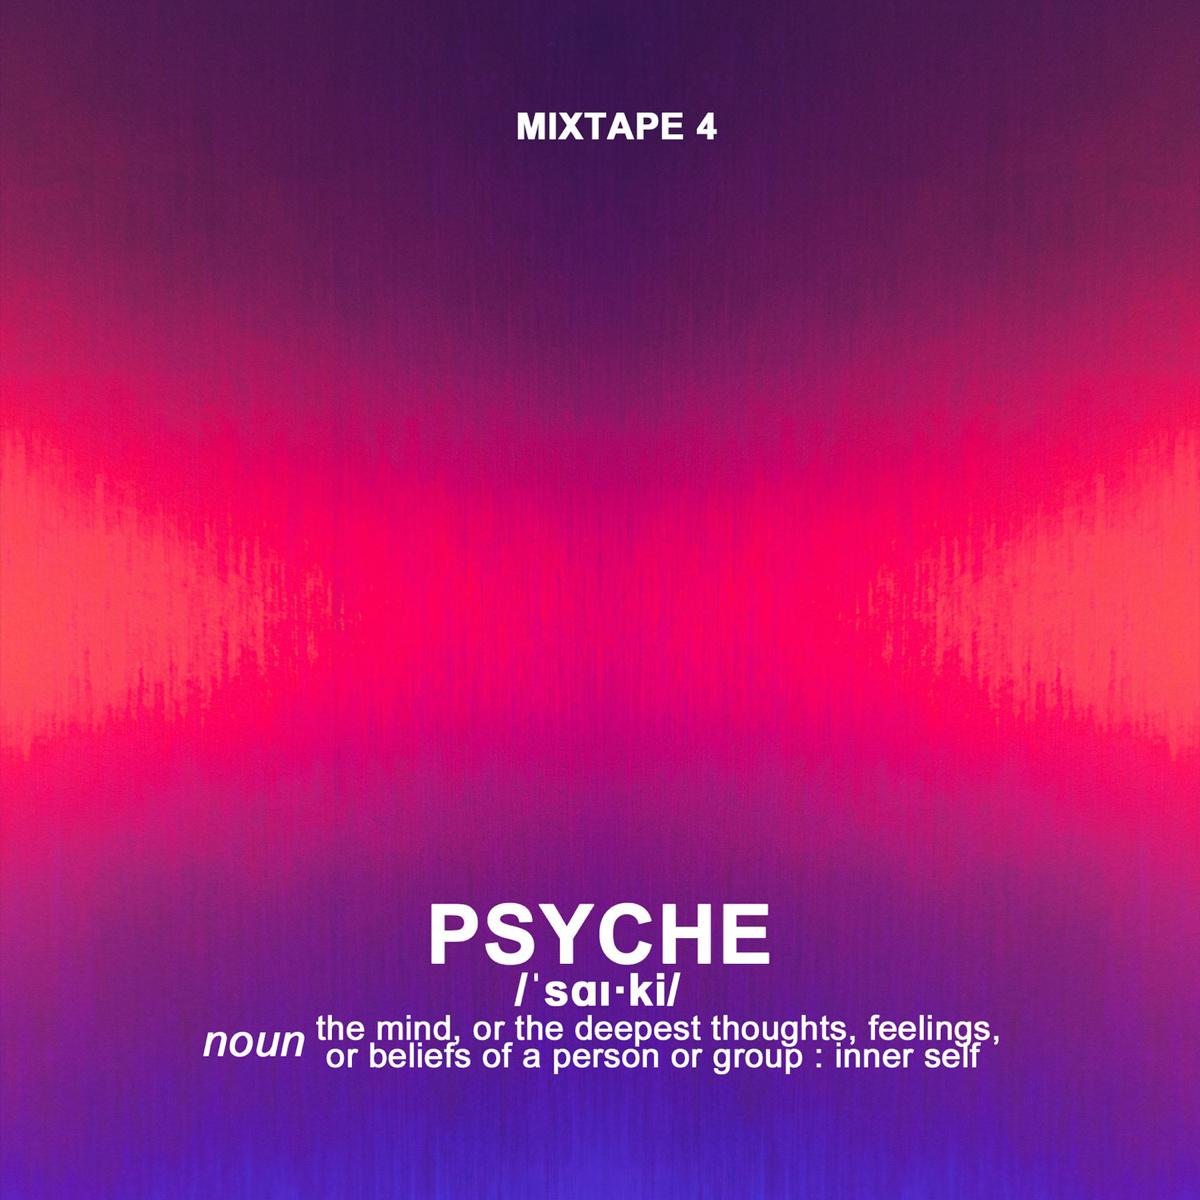 Psyche